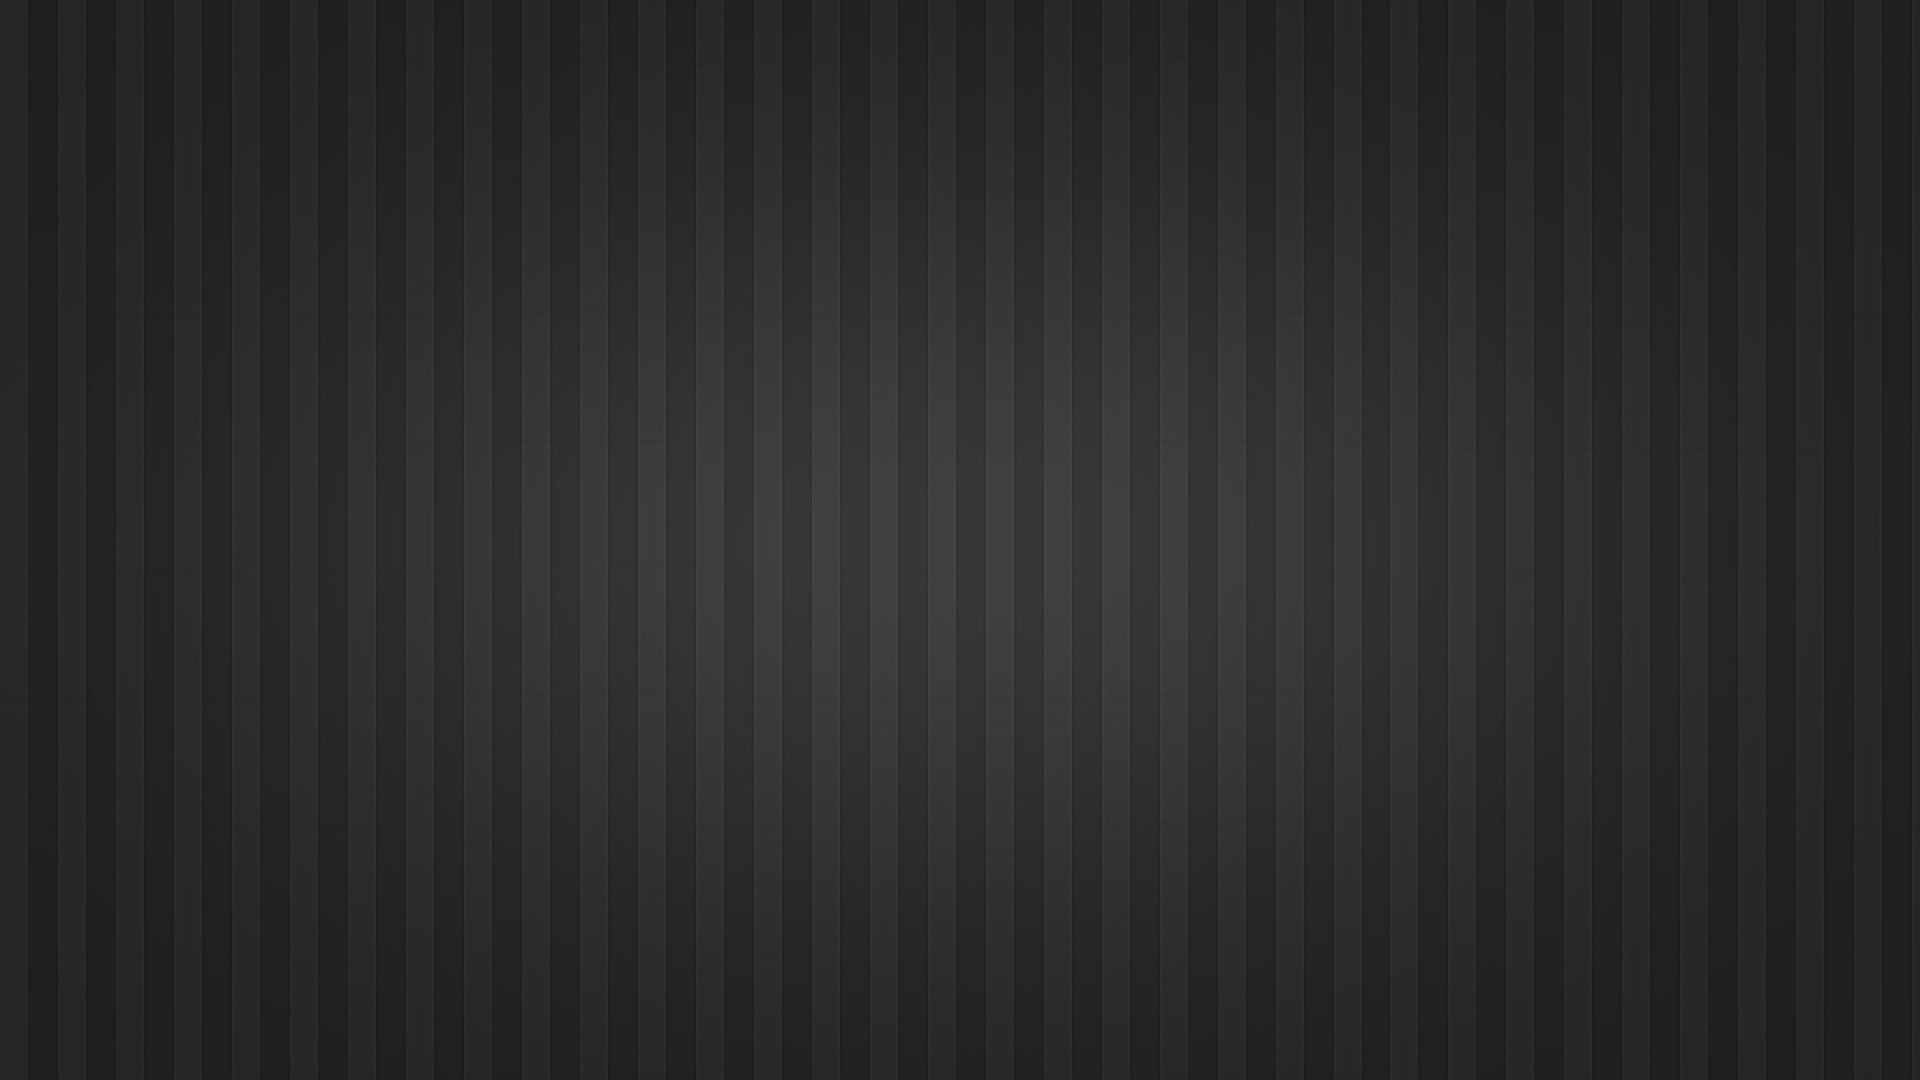 1920x1080 Dark Gray Stripes desktop PC and Mac wallpaper 1920x1080